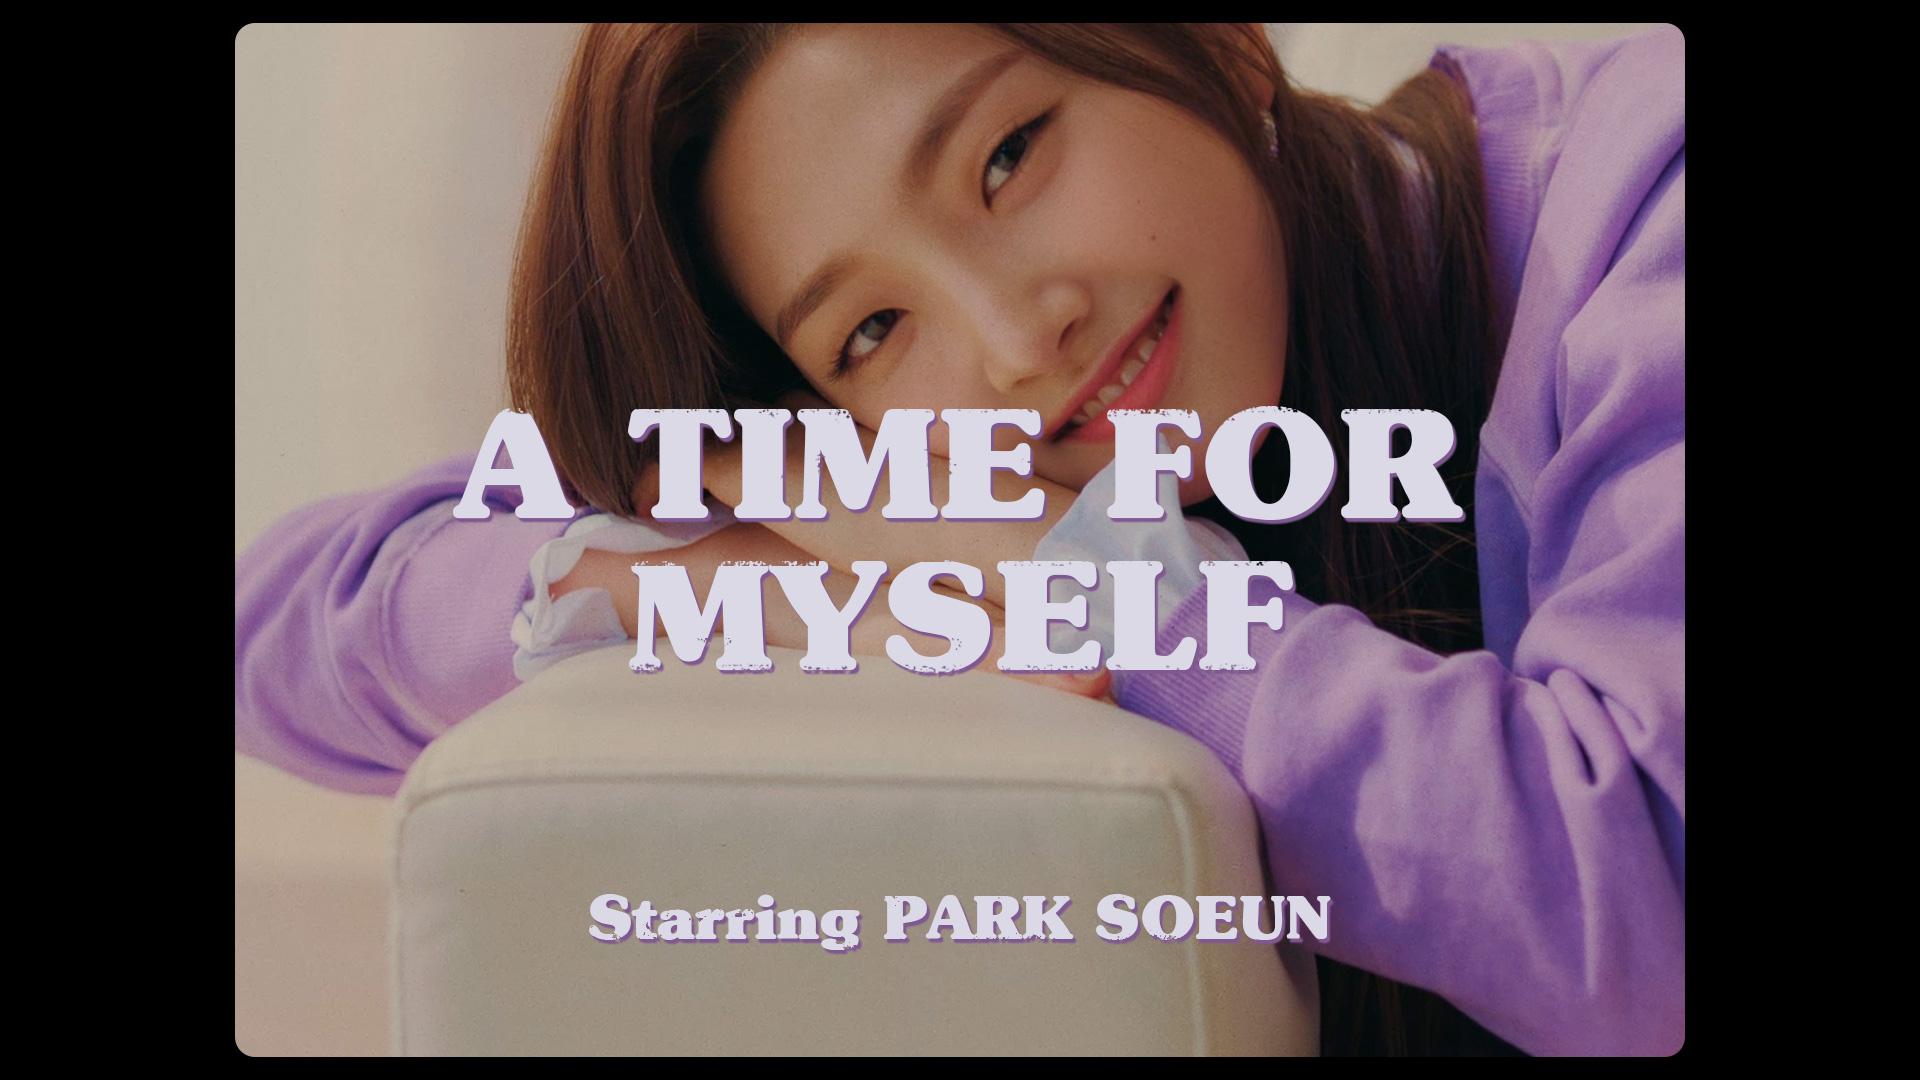 [The Weeekly Story] A TIME FOR MYSELF : PARK SOEUN